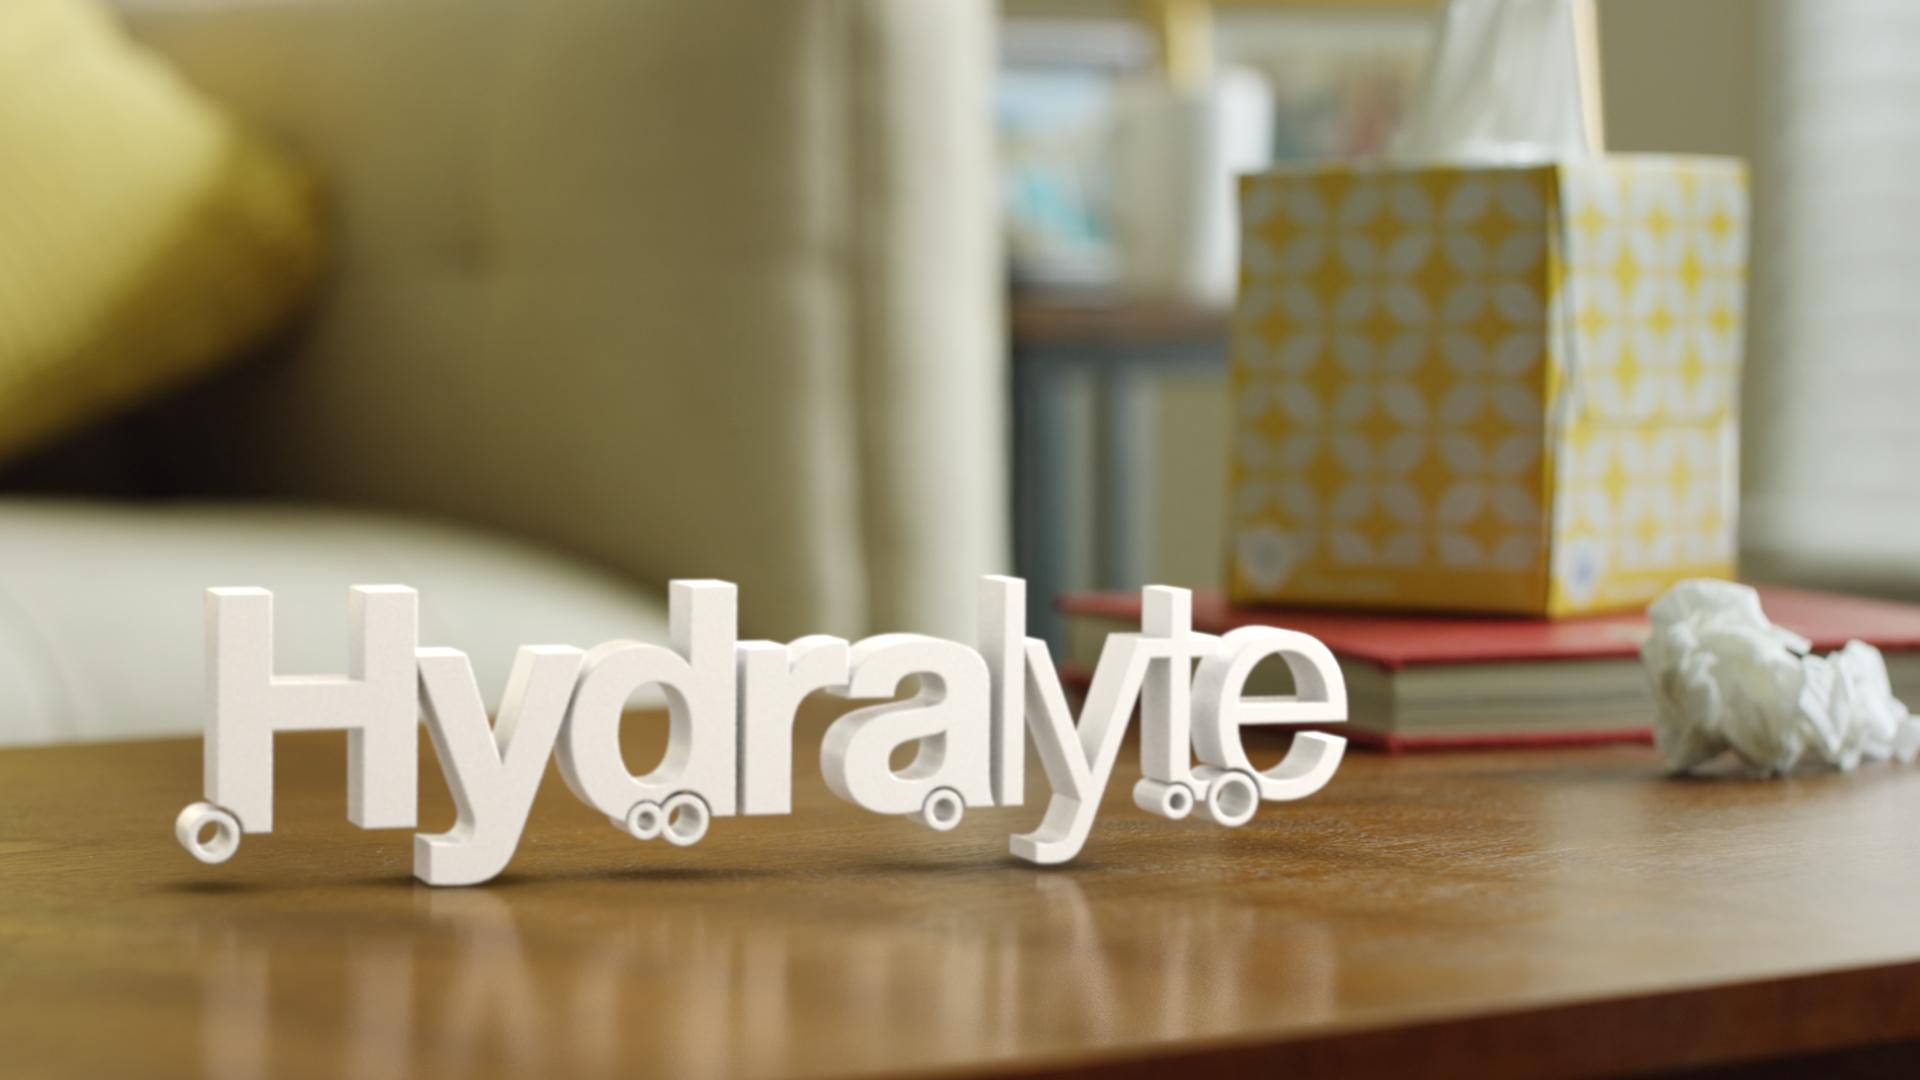 Hydralyte_grabs_Raw_1.1.1.jpg